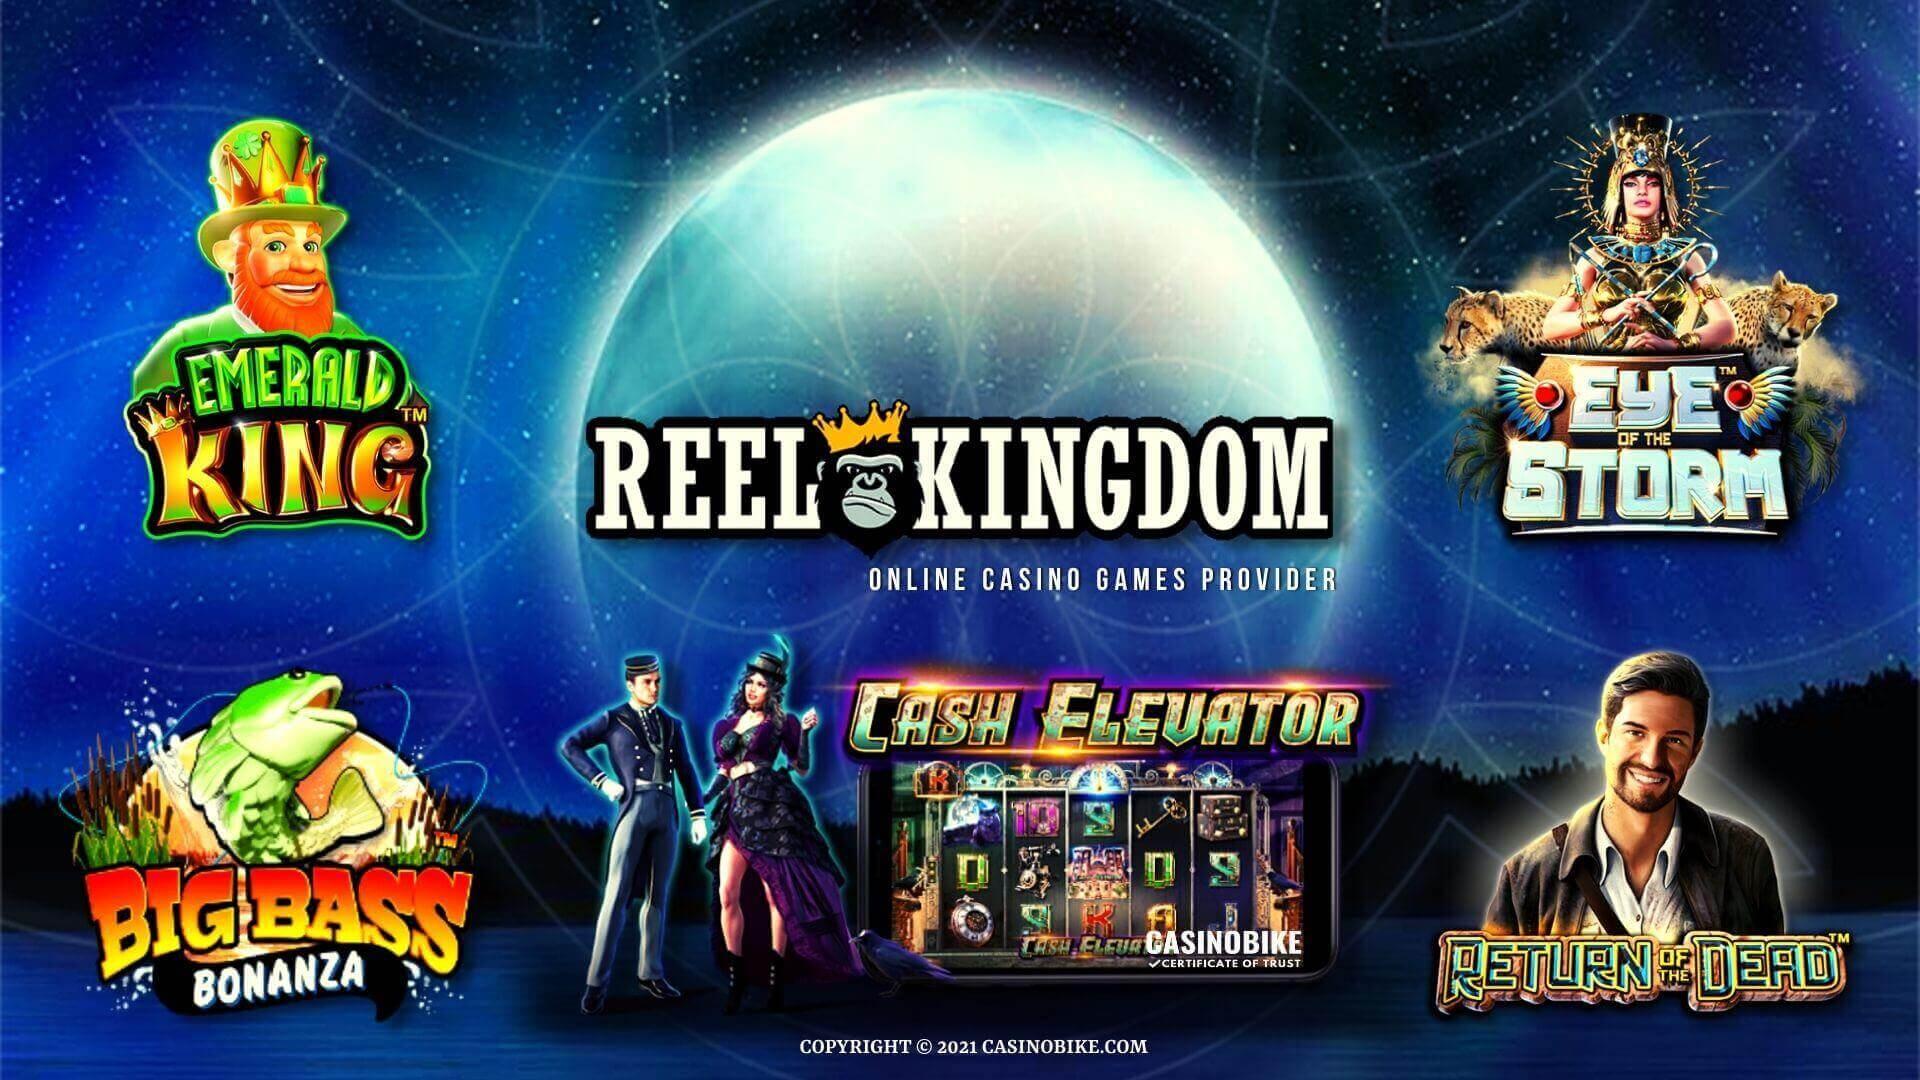 Reel Kingdom Casino Games Provider